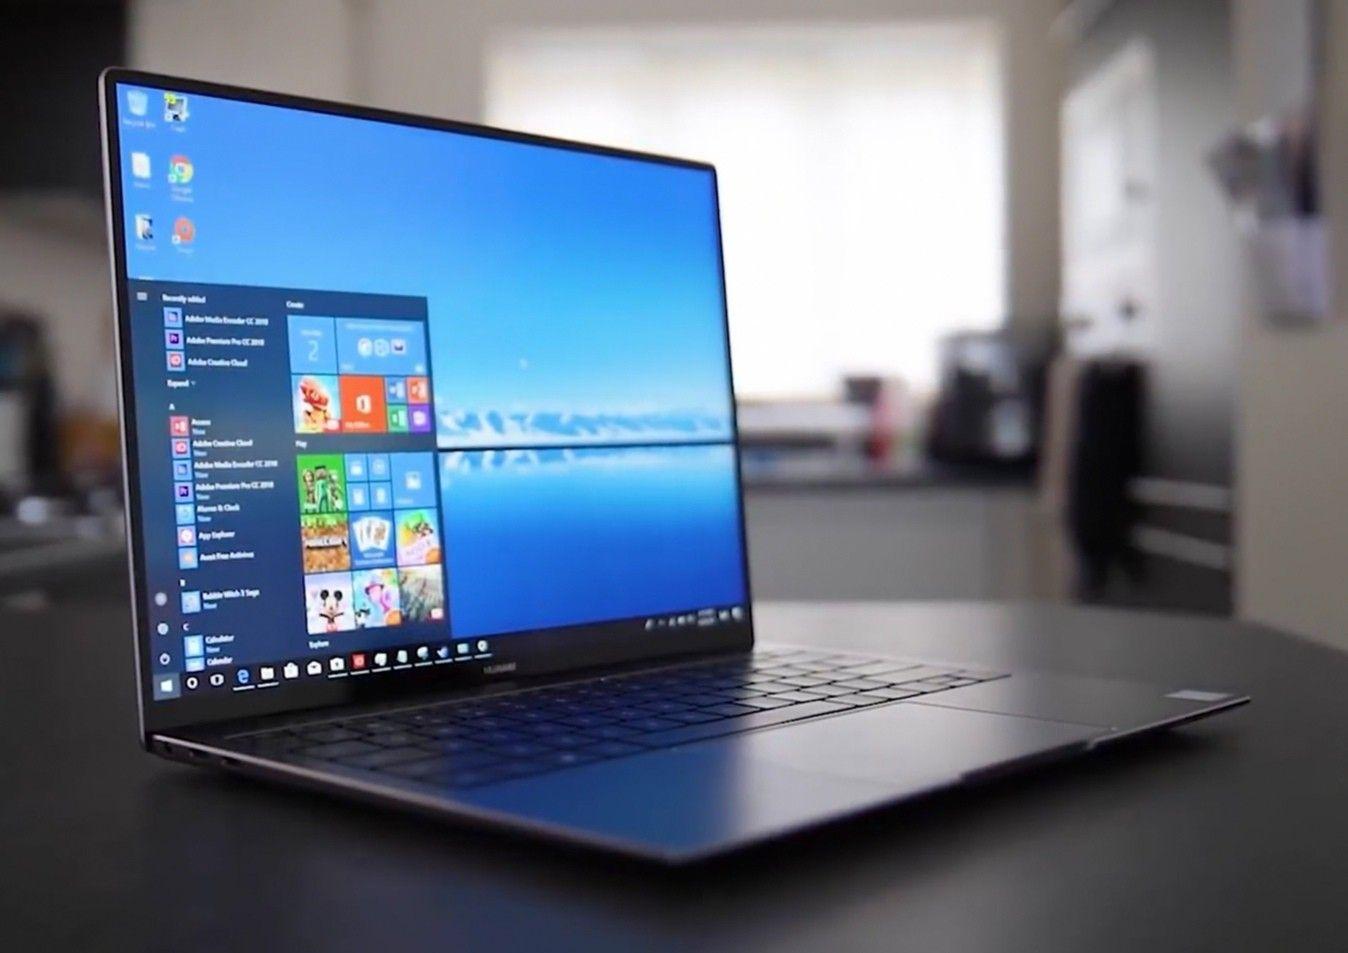 Huawei Matebook X Pro 2019 In 2020 Laptop Photography Microsoft Surface Laptop Huawei